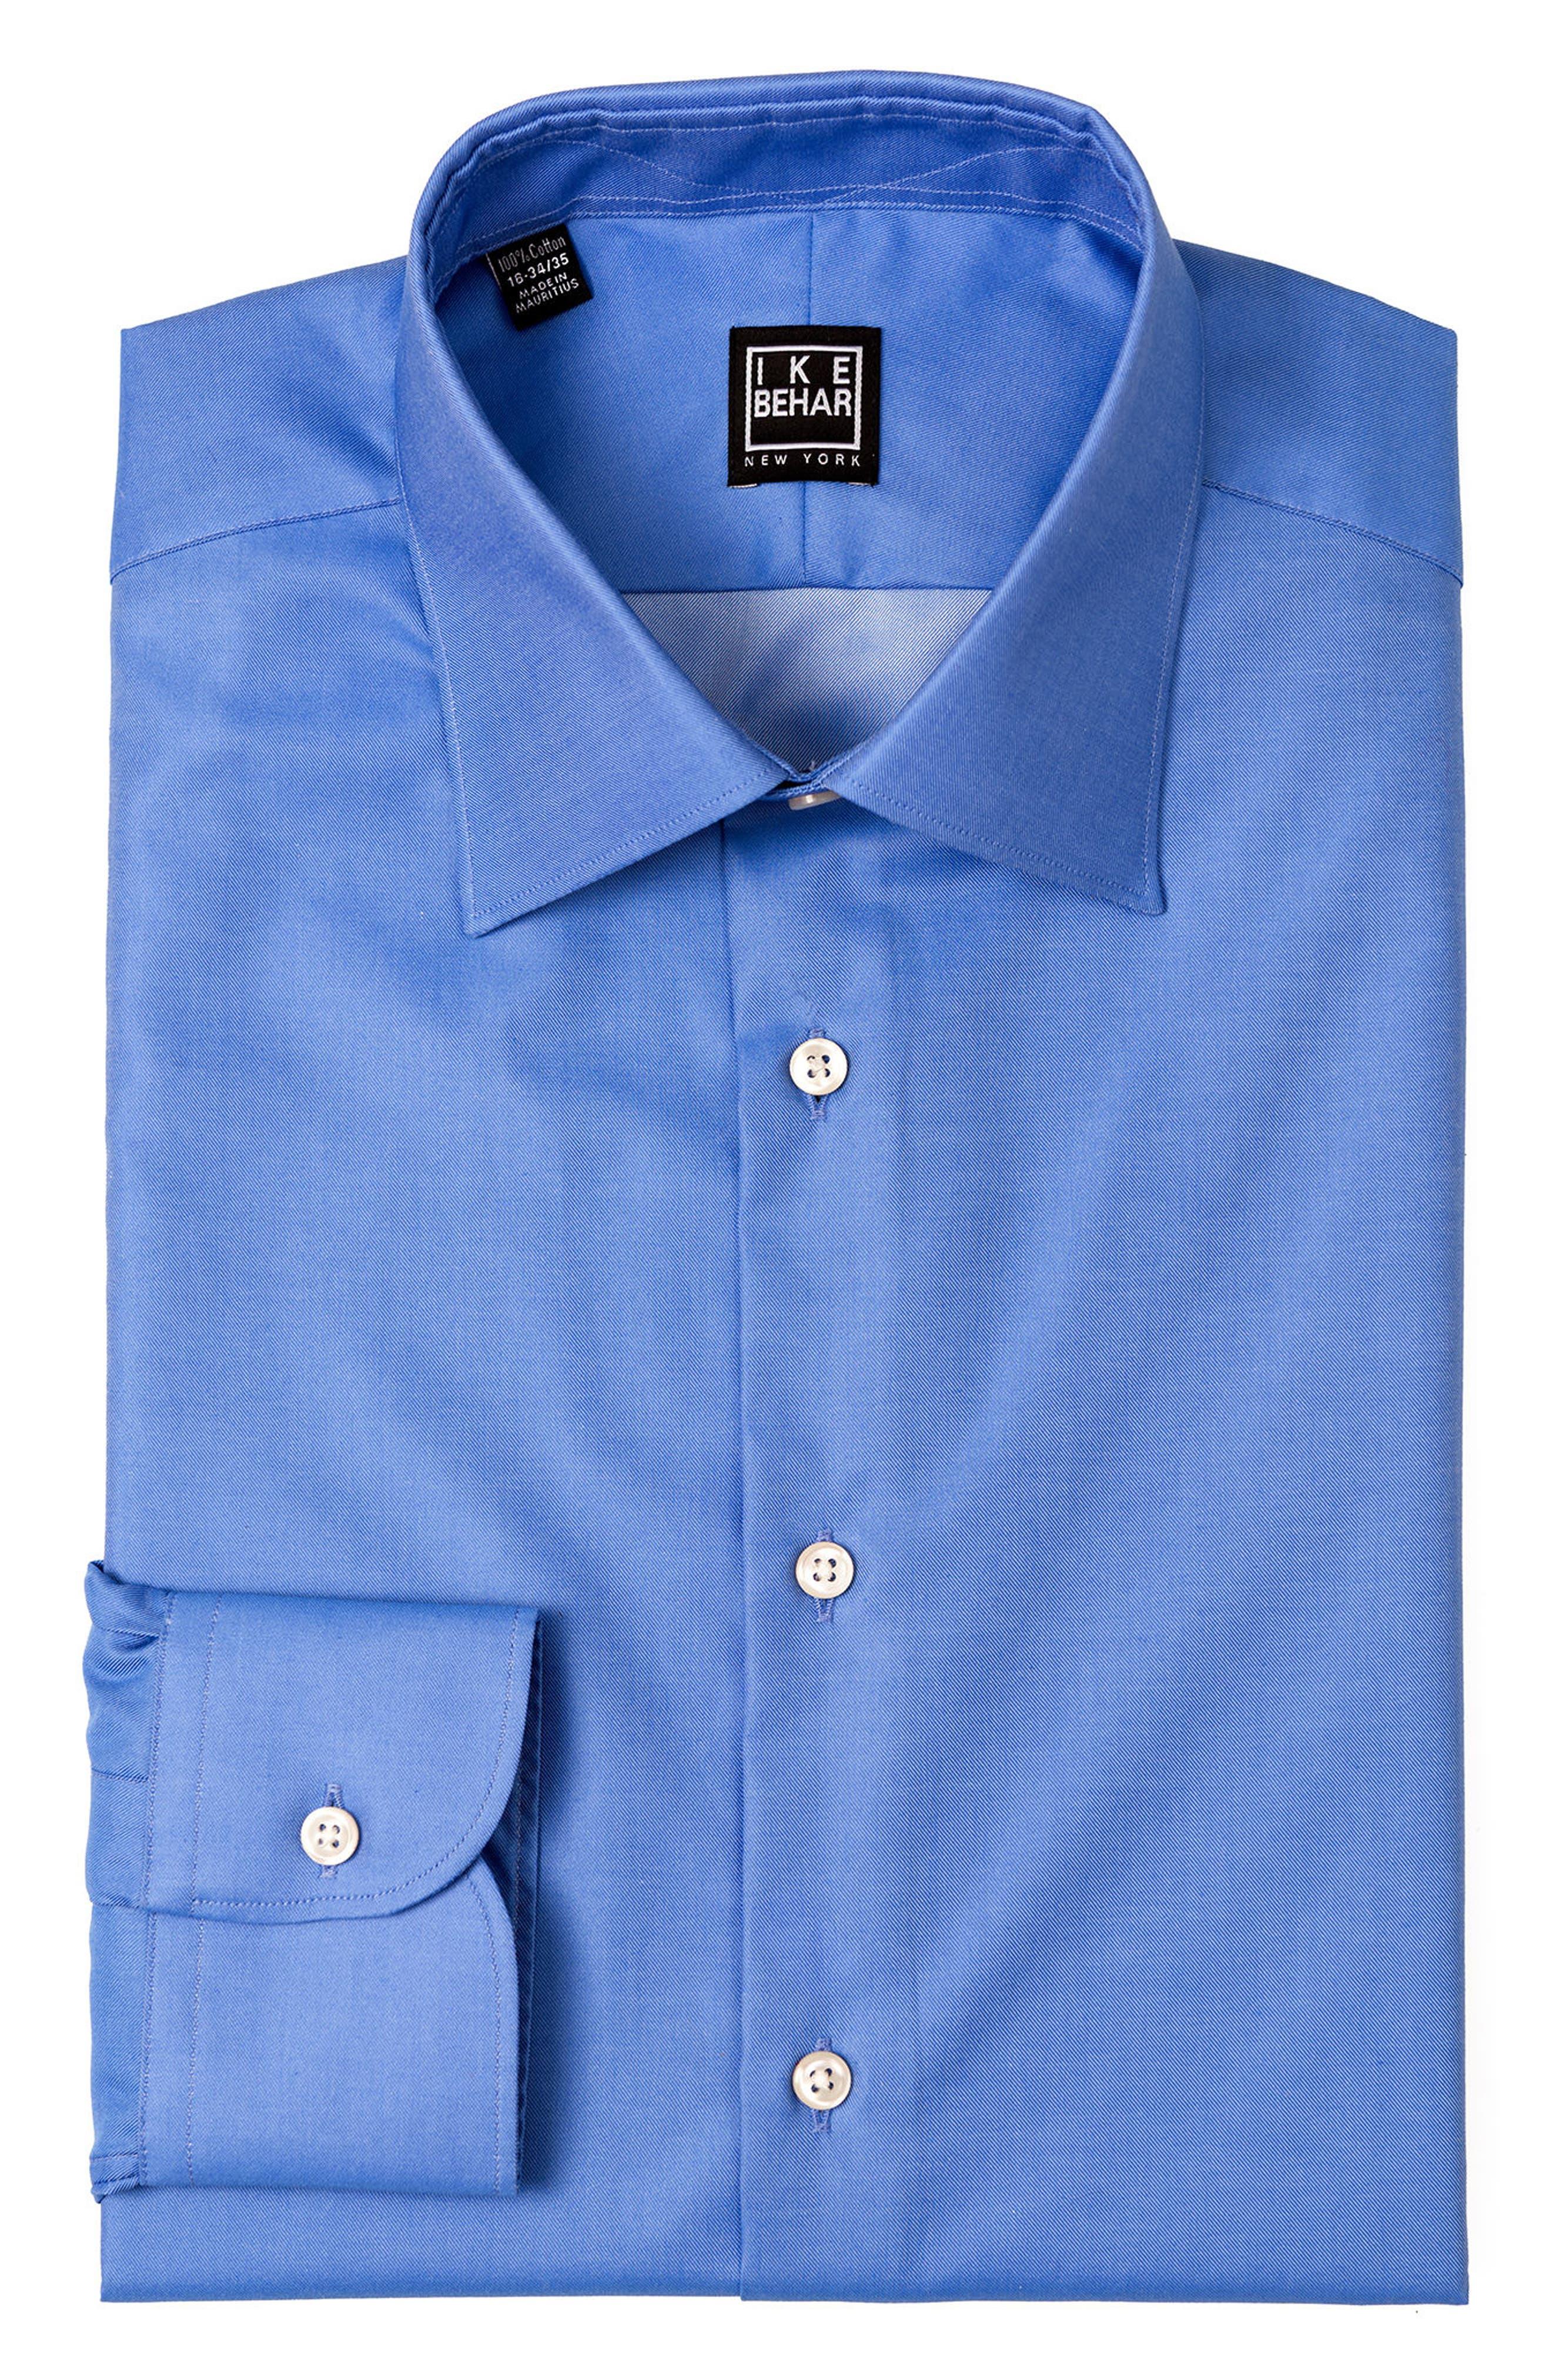 Regular Fit Solid Dress Shirt,                             Alternate thumbnail 5, color,                             DARK BLUE